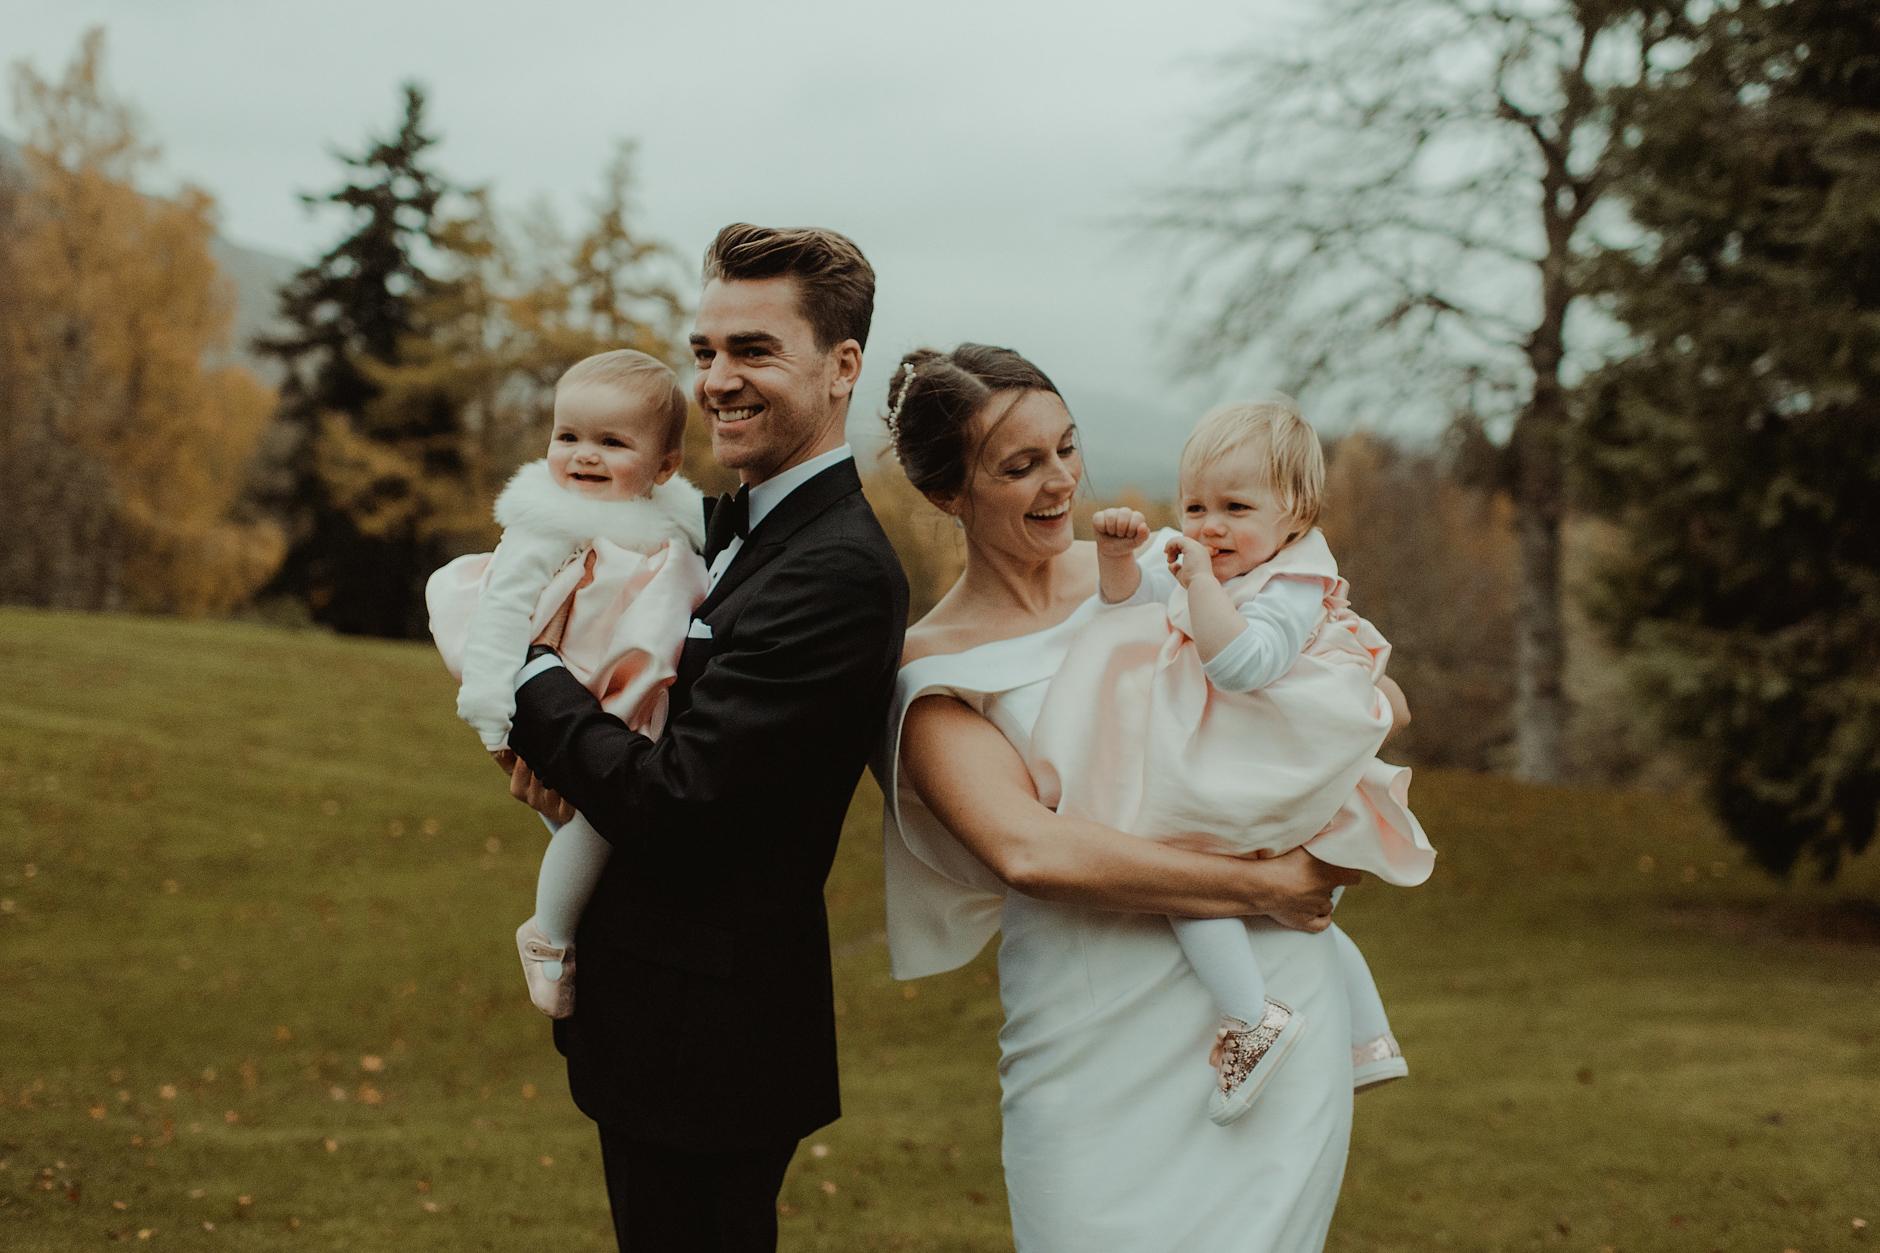 Glentruim-Wedding-Nikki-Leadbetter-Photography-214.jpg